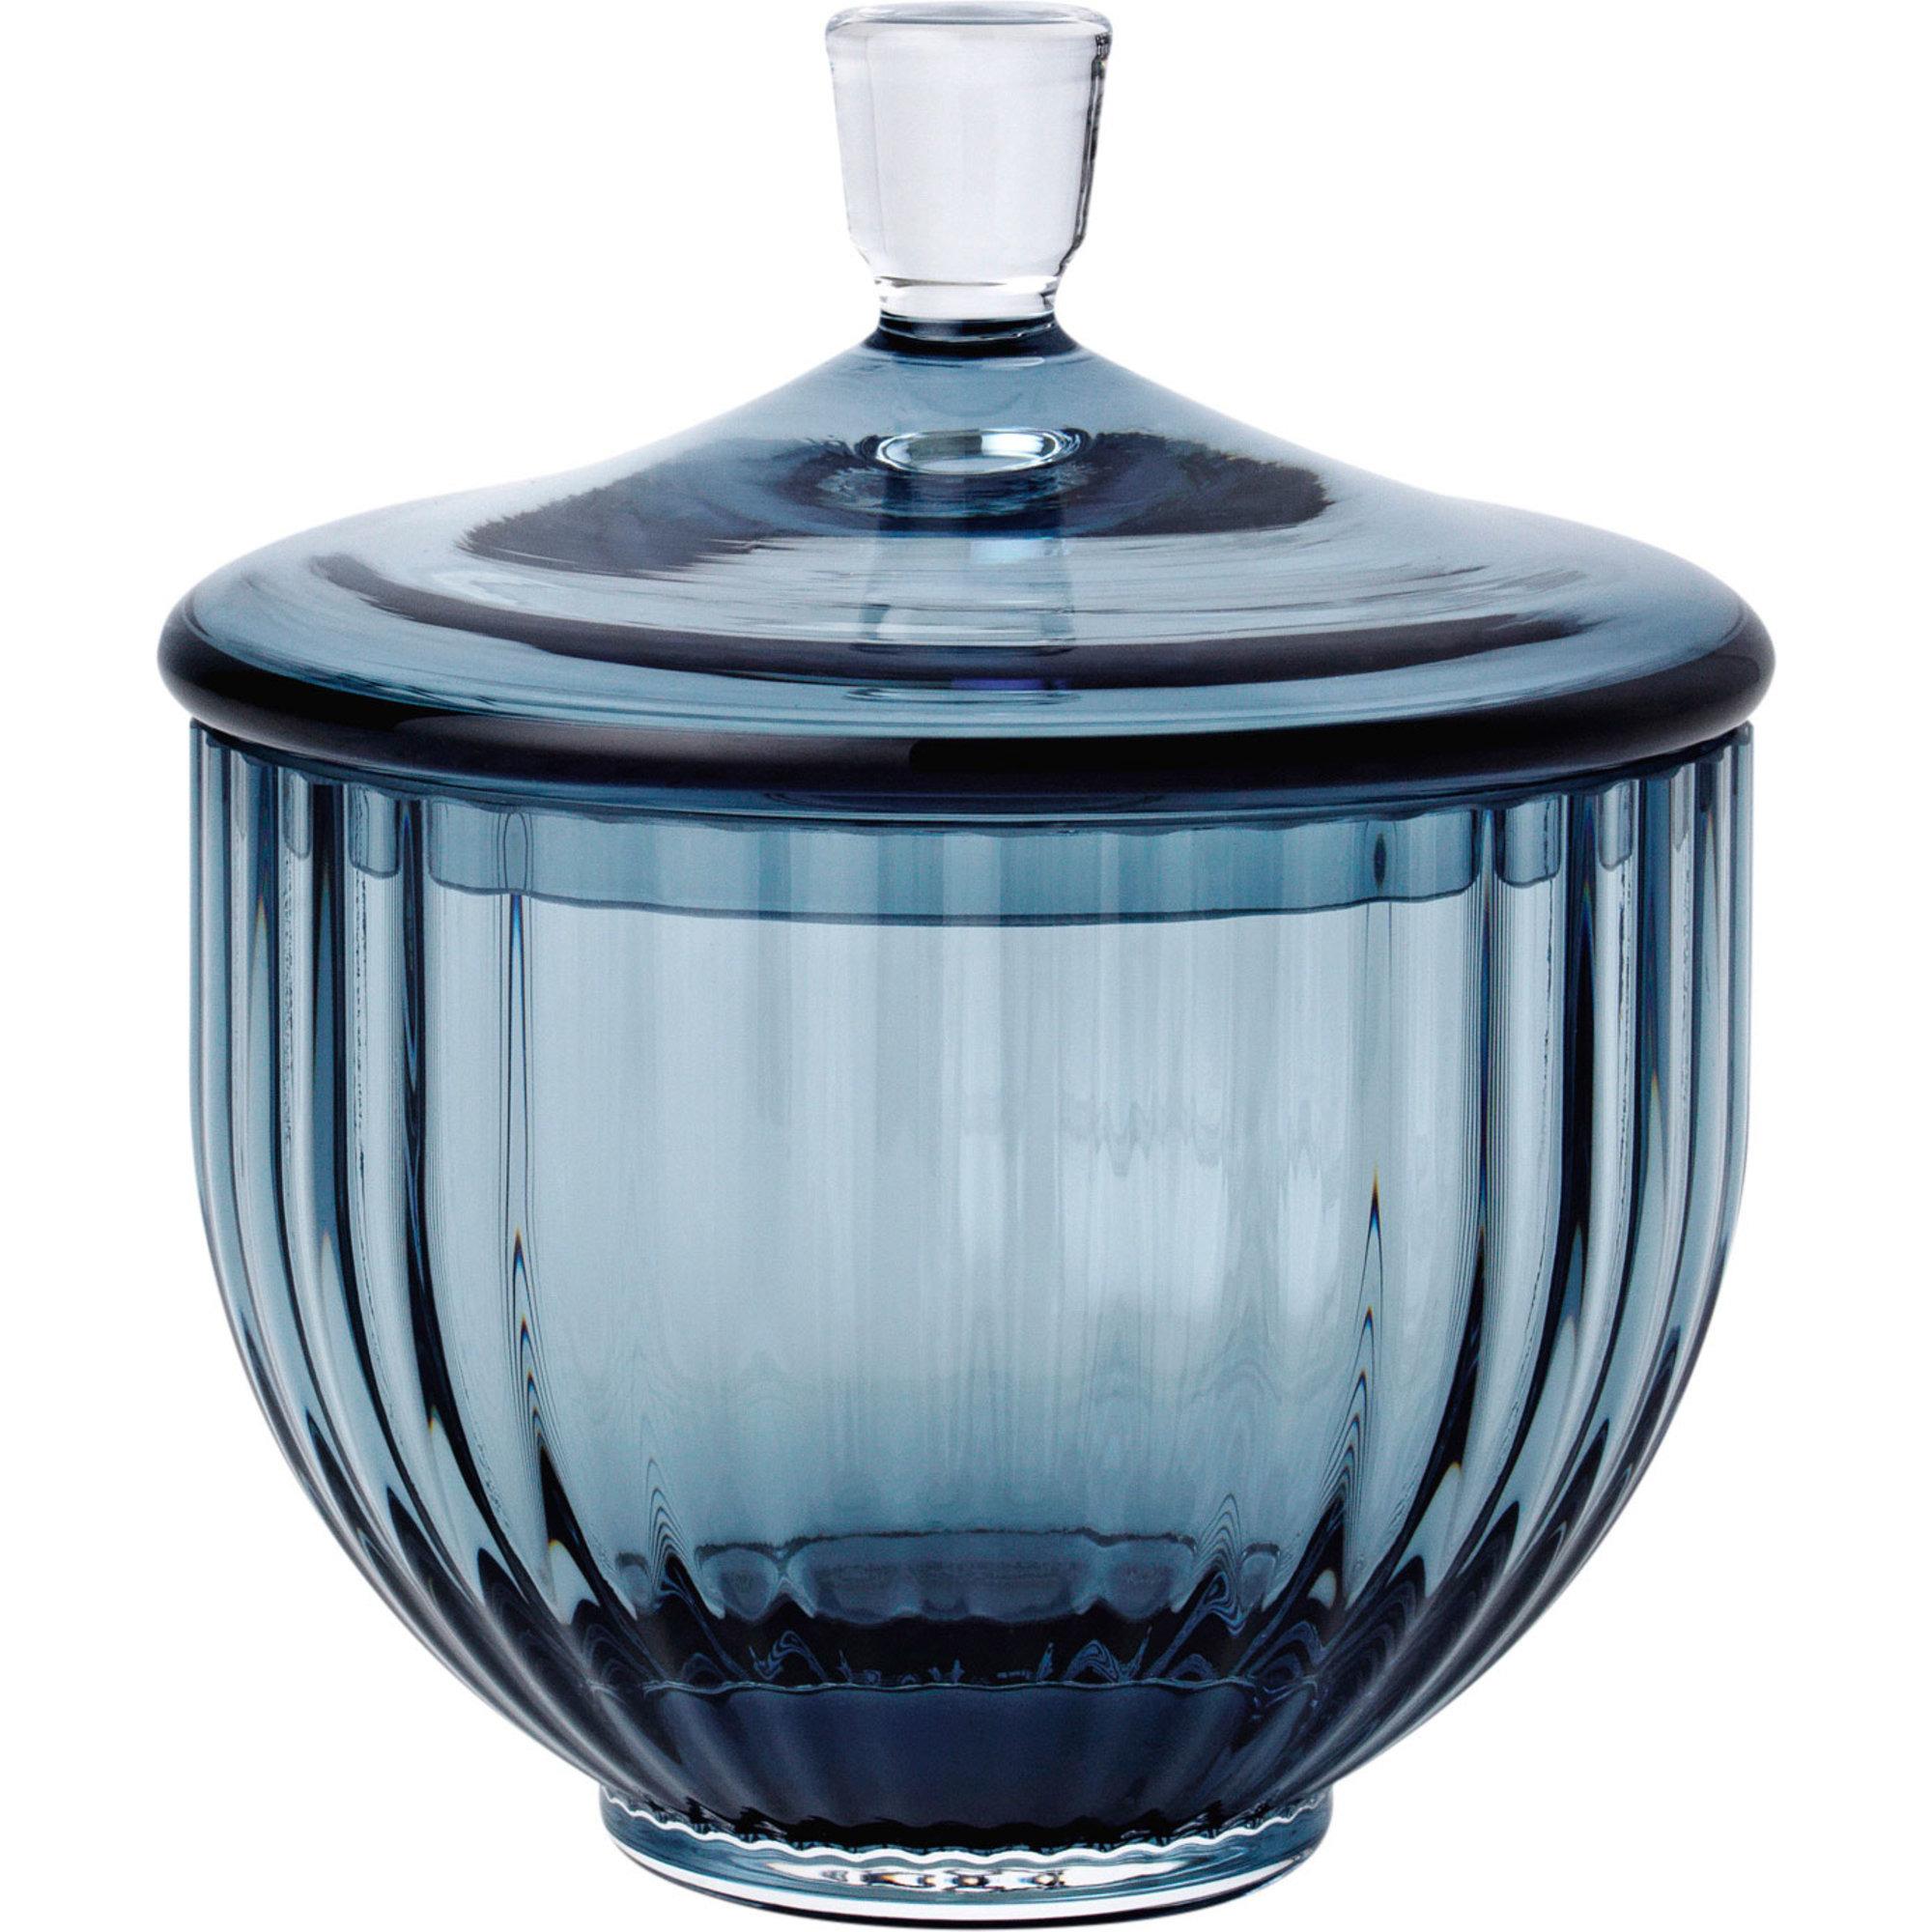 Lyngby Porcelæn Glas bonbonniere Ø 10 cm. blå